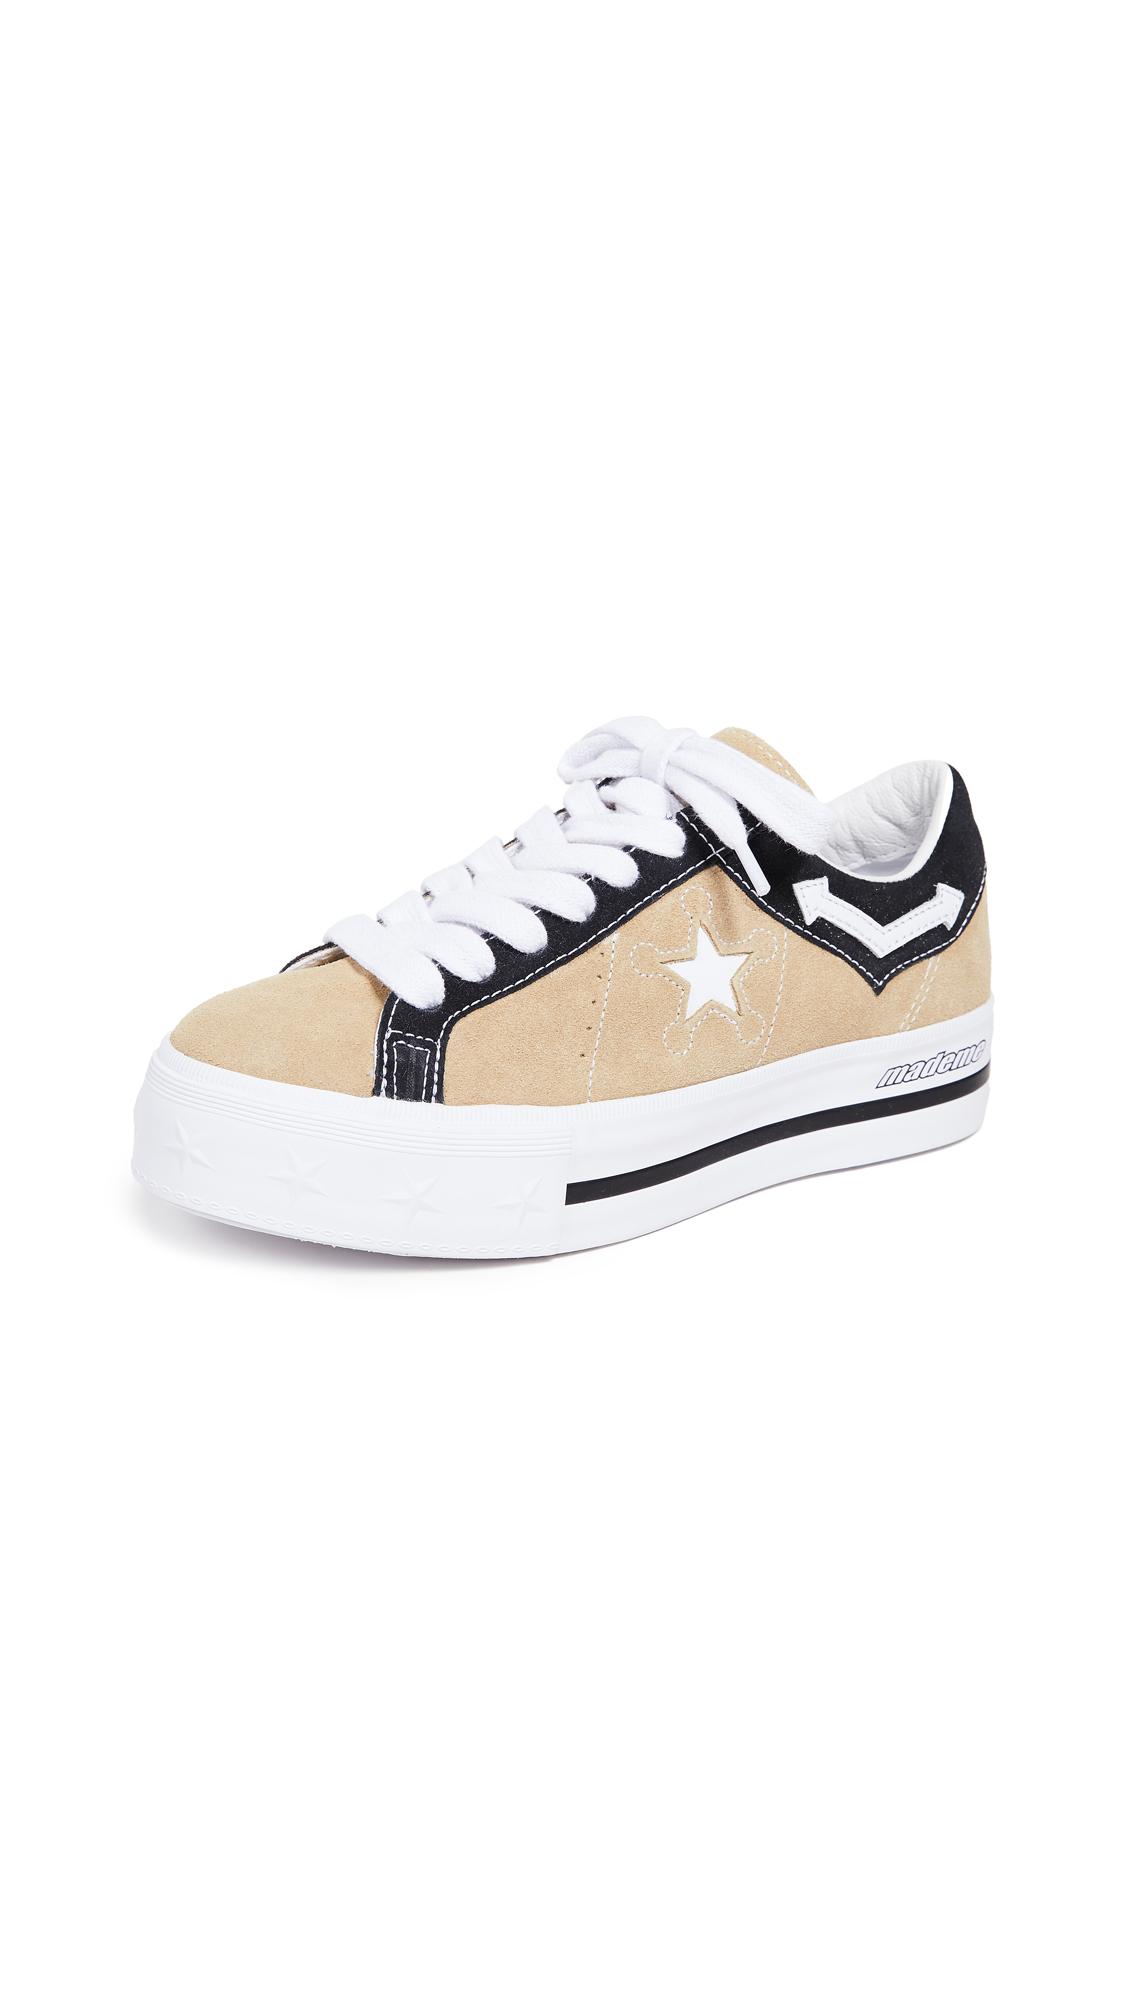 Converse x Mademe Platform Sneakers - Wood Ash/White/Black